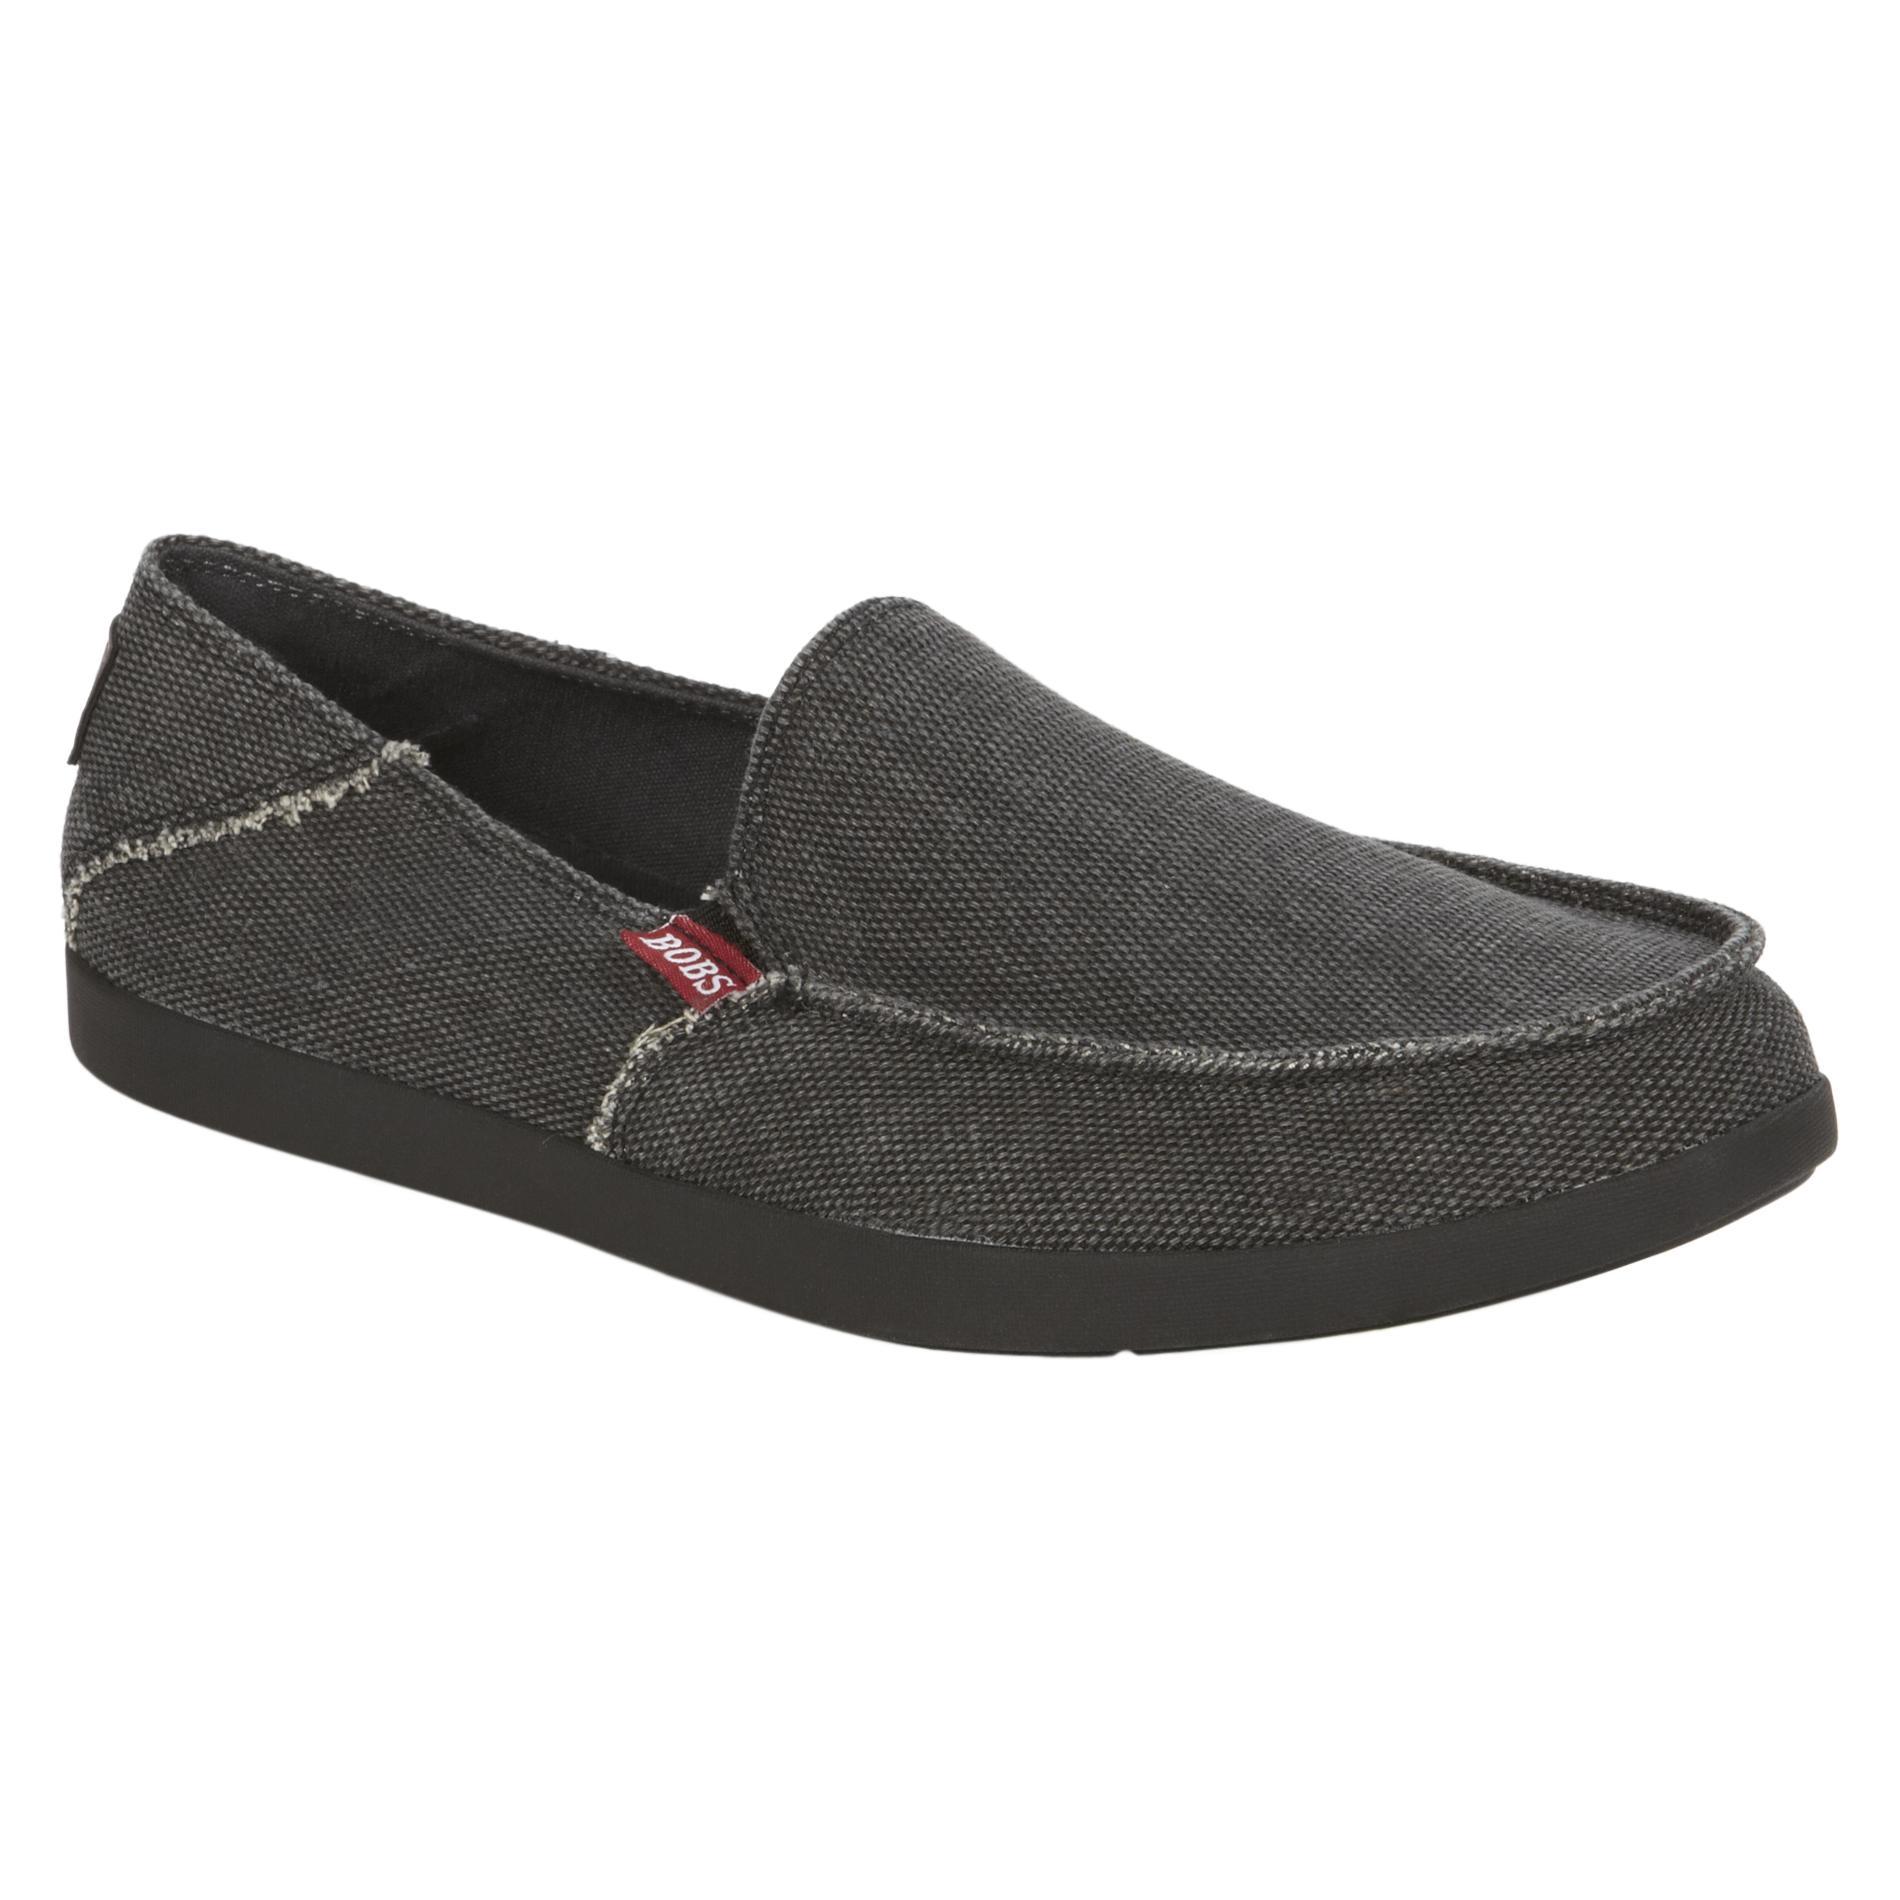 Men's Bota 2.0 Casual Slip-On Shoe- Black